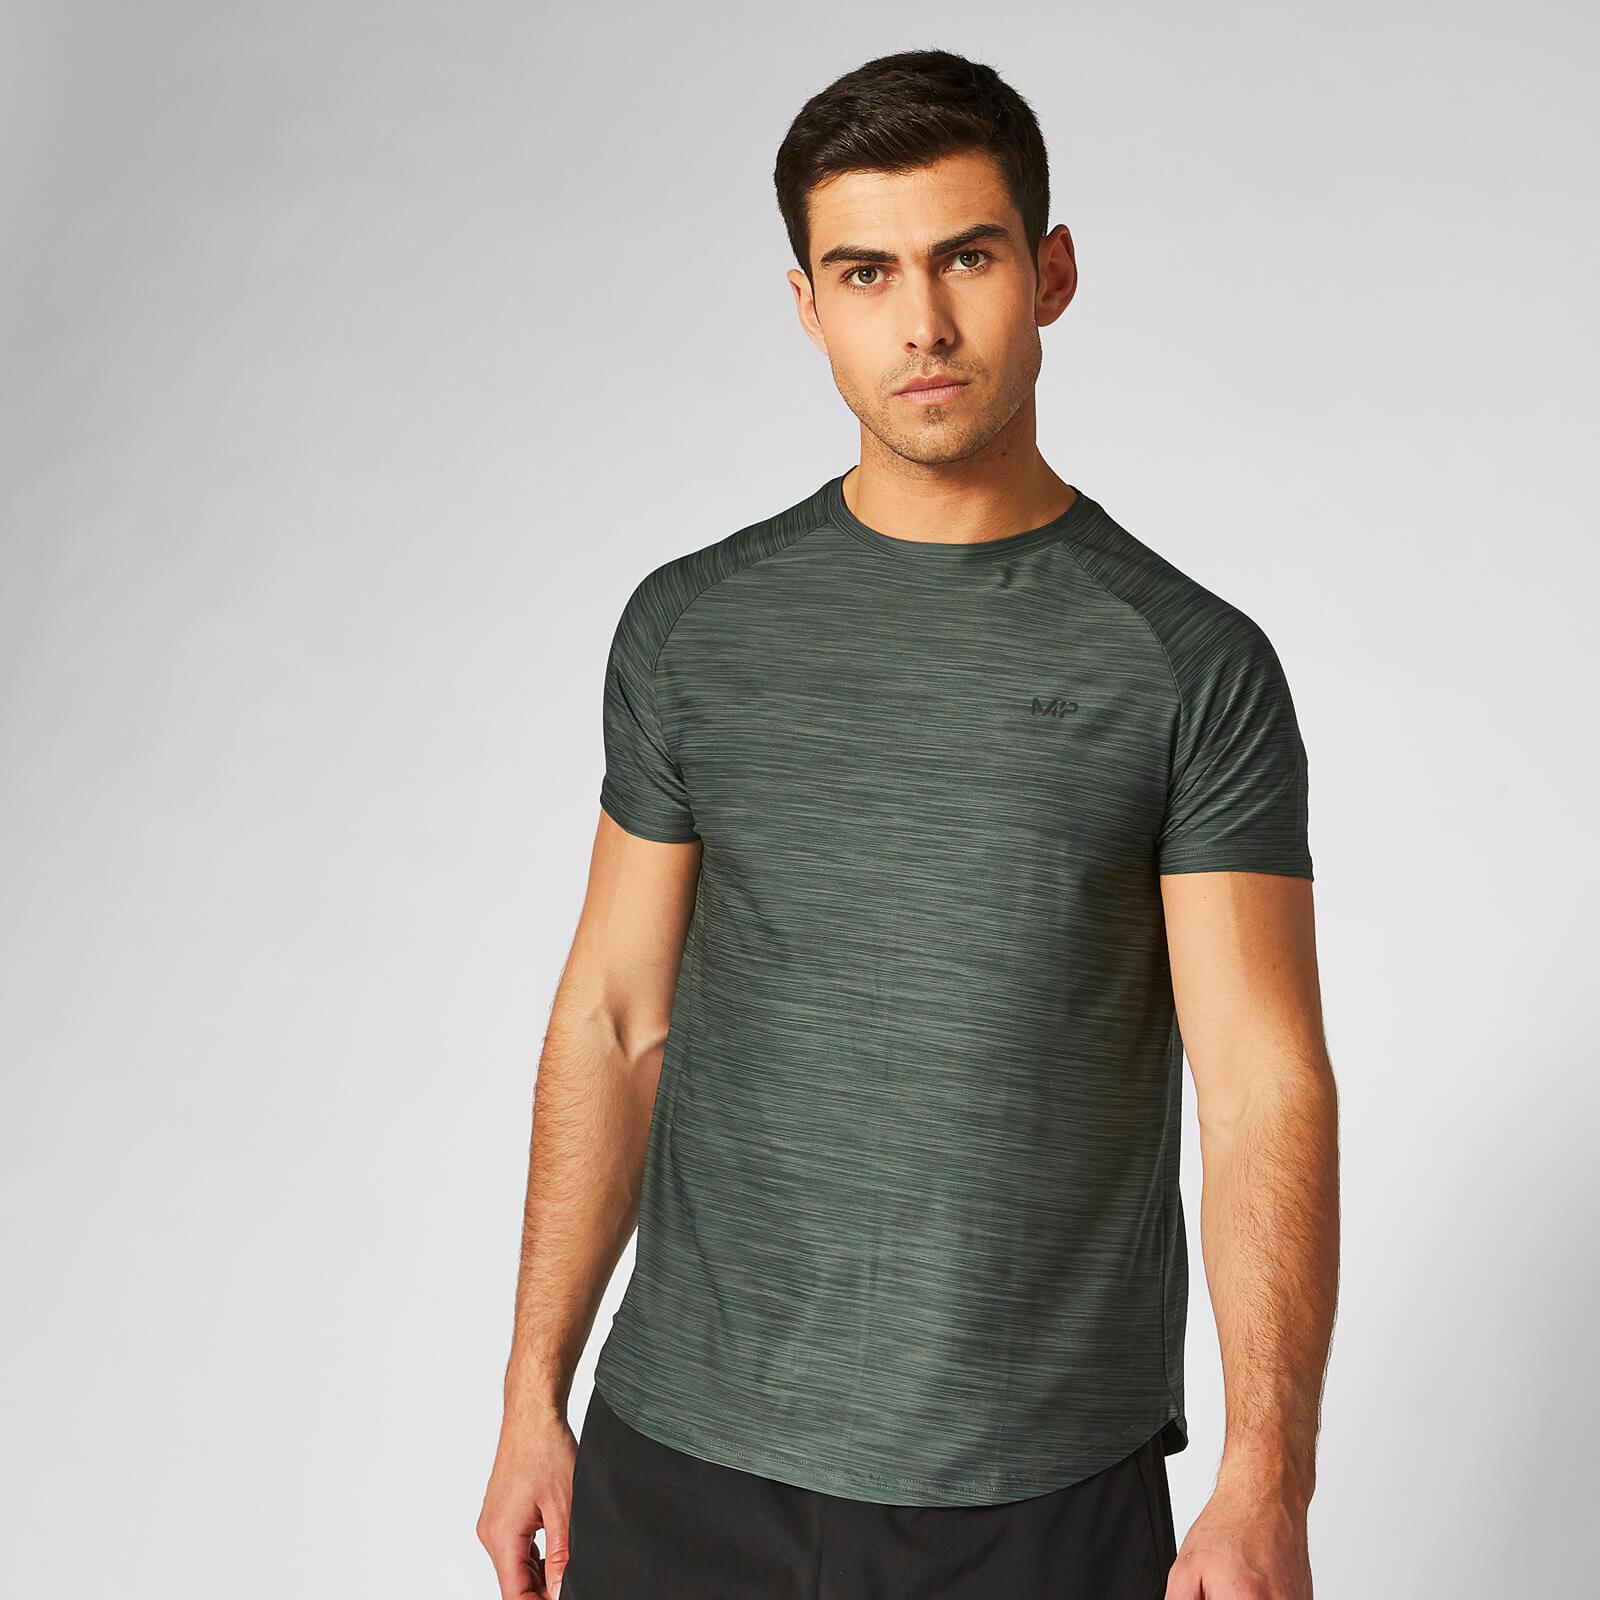 a406841af Dry-Tech Infinity T-Shirt - Pine Marl